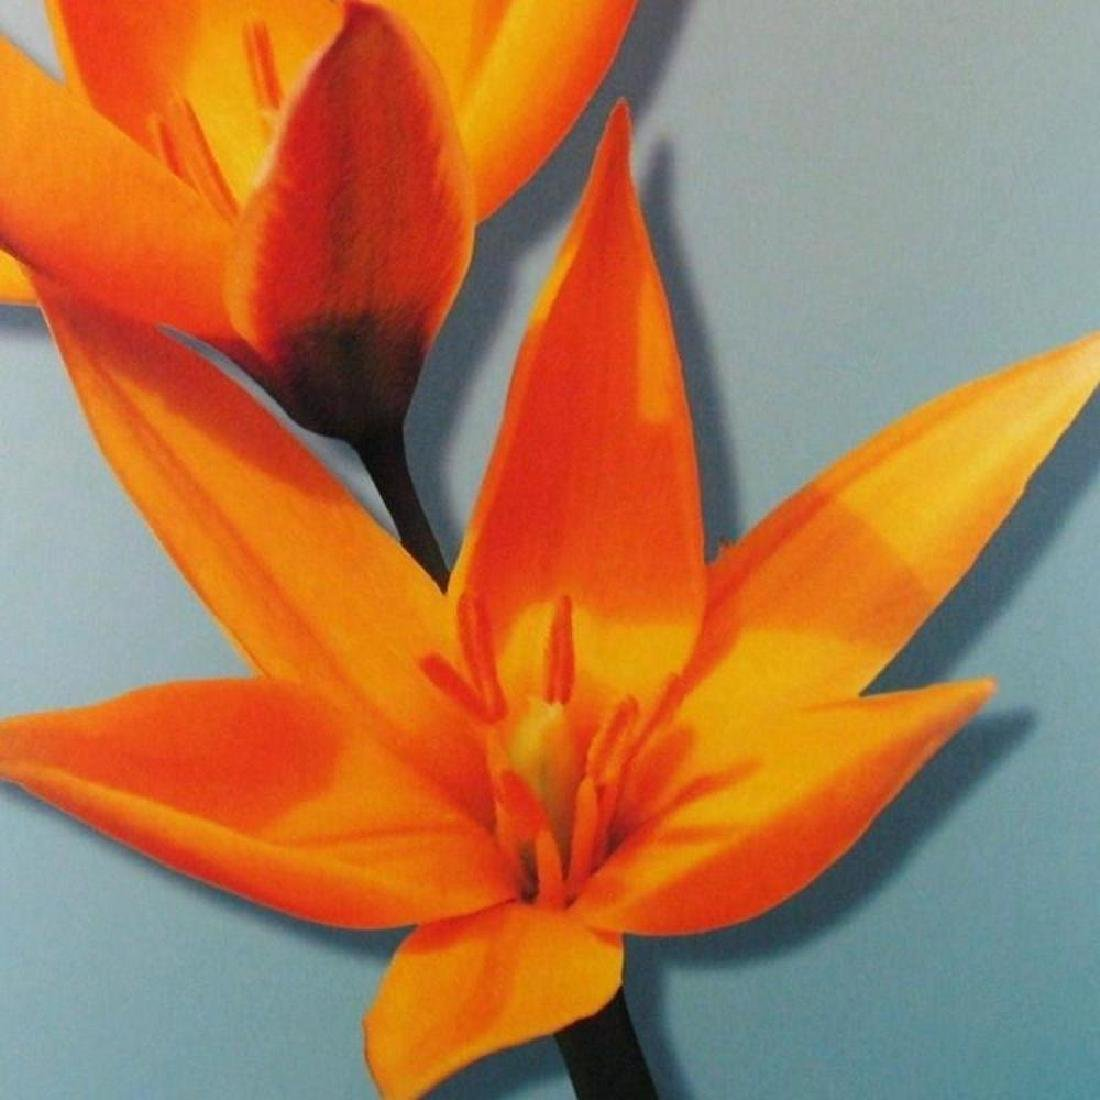 Canvas Giclee Fantastic Sale Colorful Best Art Deal - 3